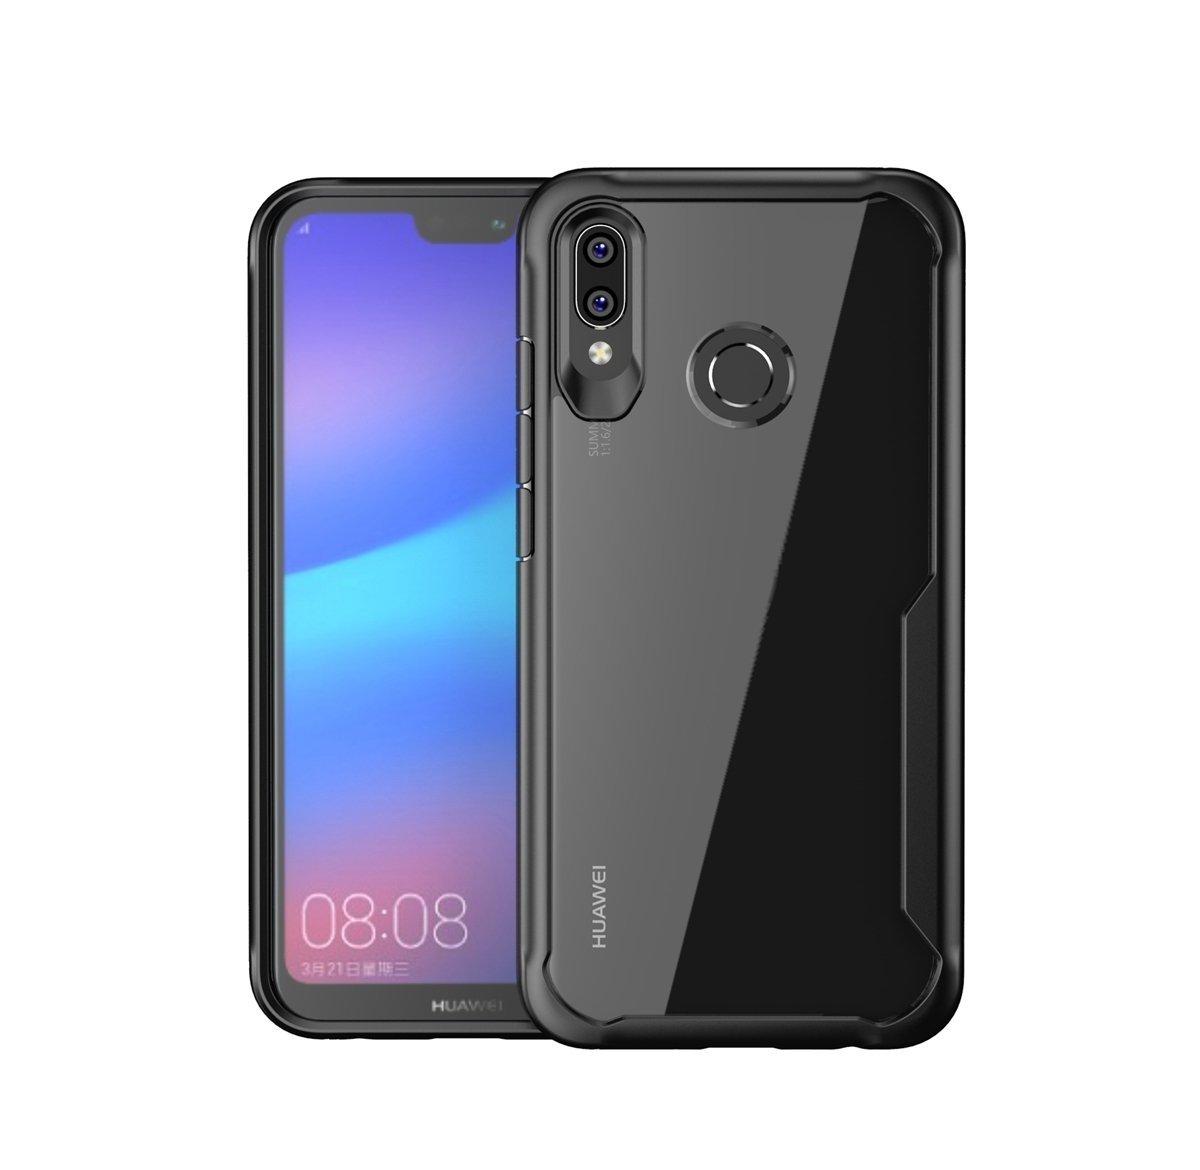 Amazon.com: Huawei Nova 3 Case, Hybrid Shockproof Slim ...